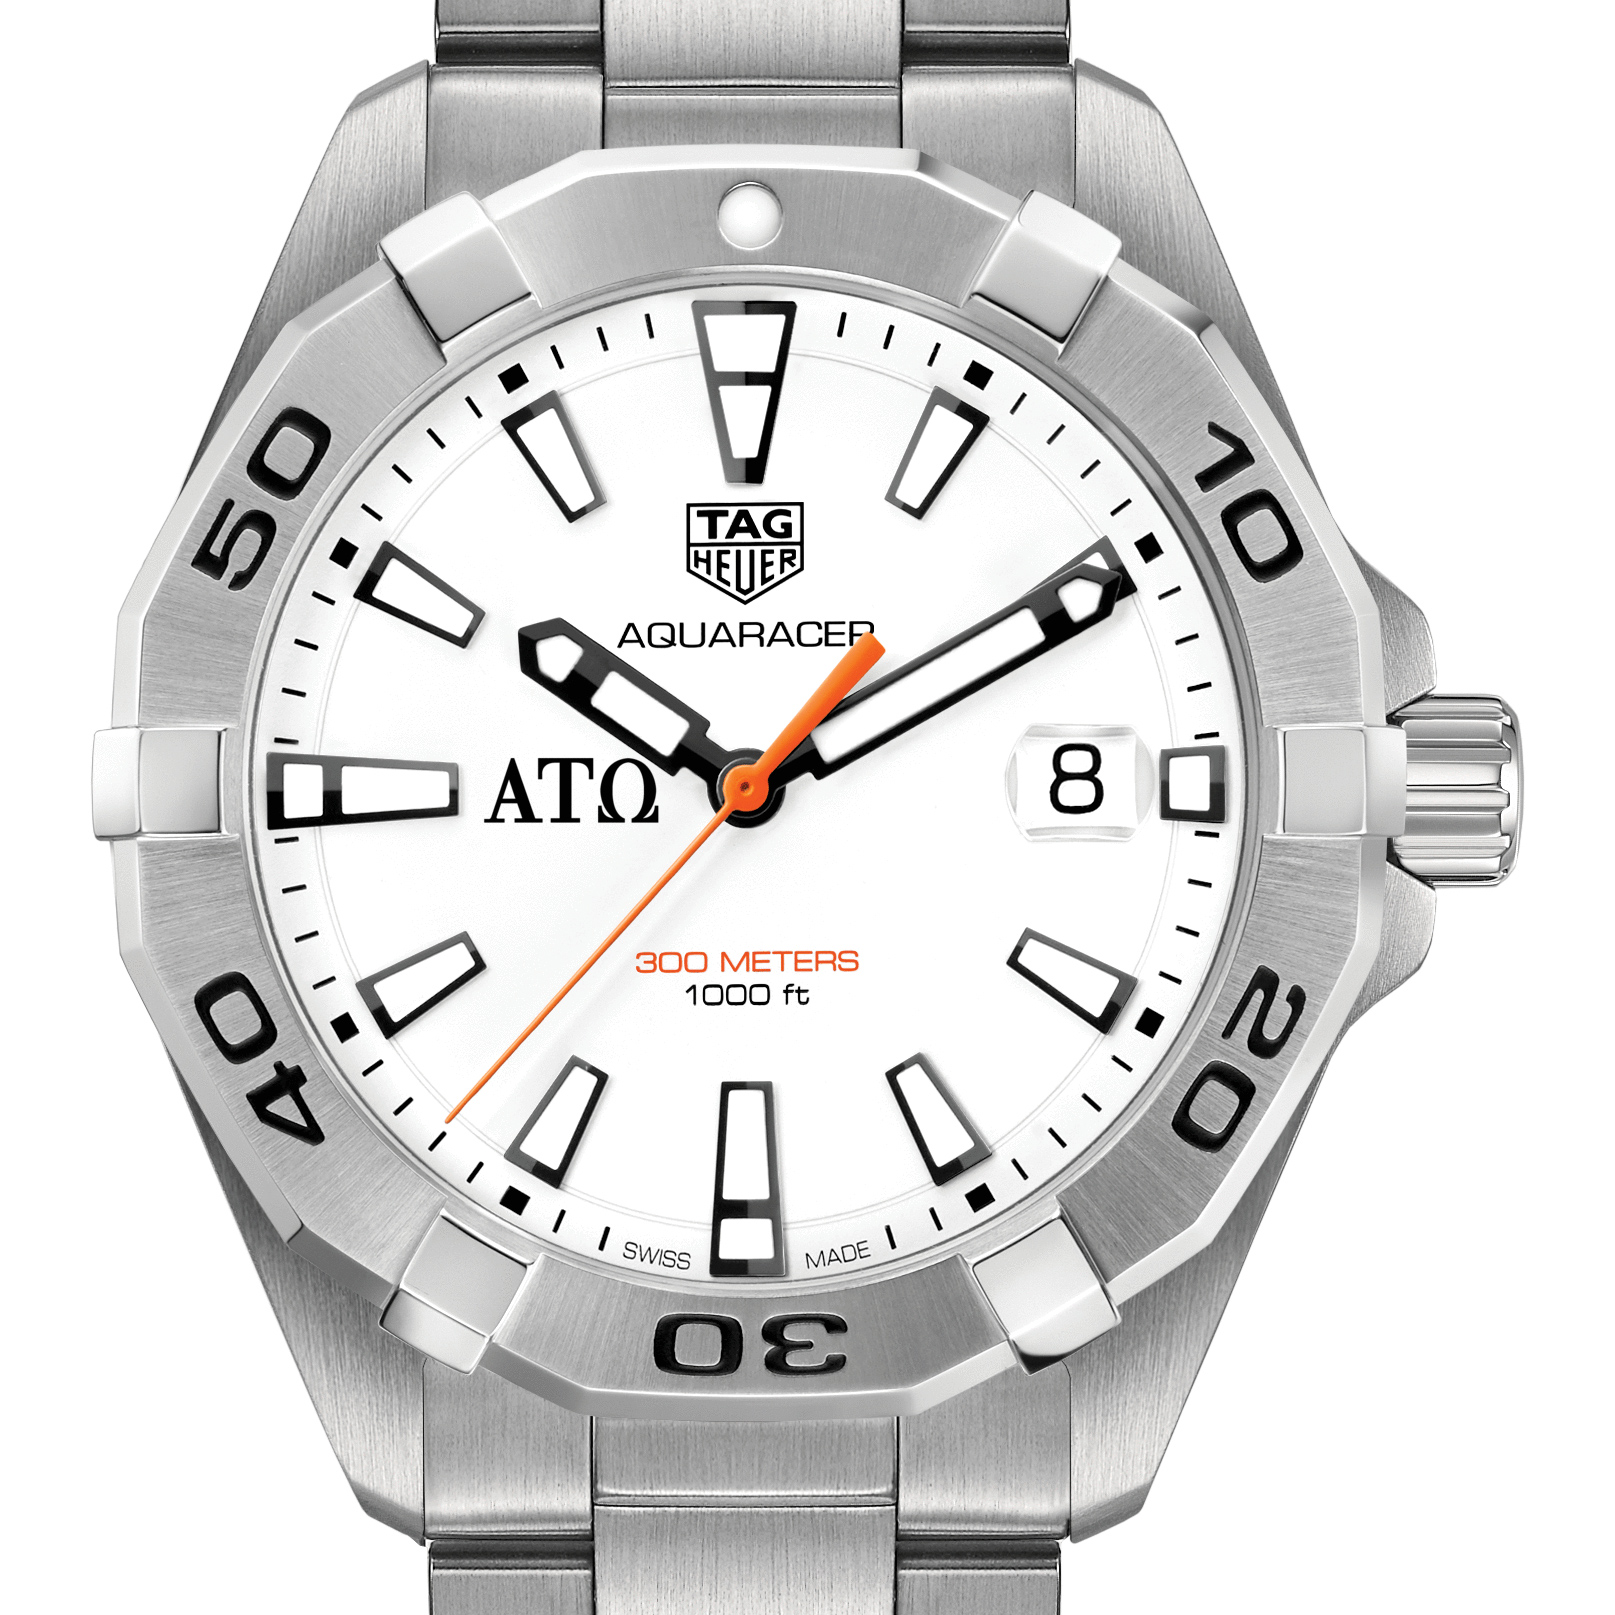 Alpha Tau Omega Men's TAG Heuer Steel Aquaracer